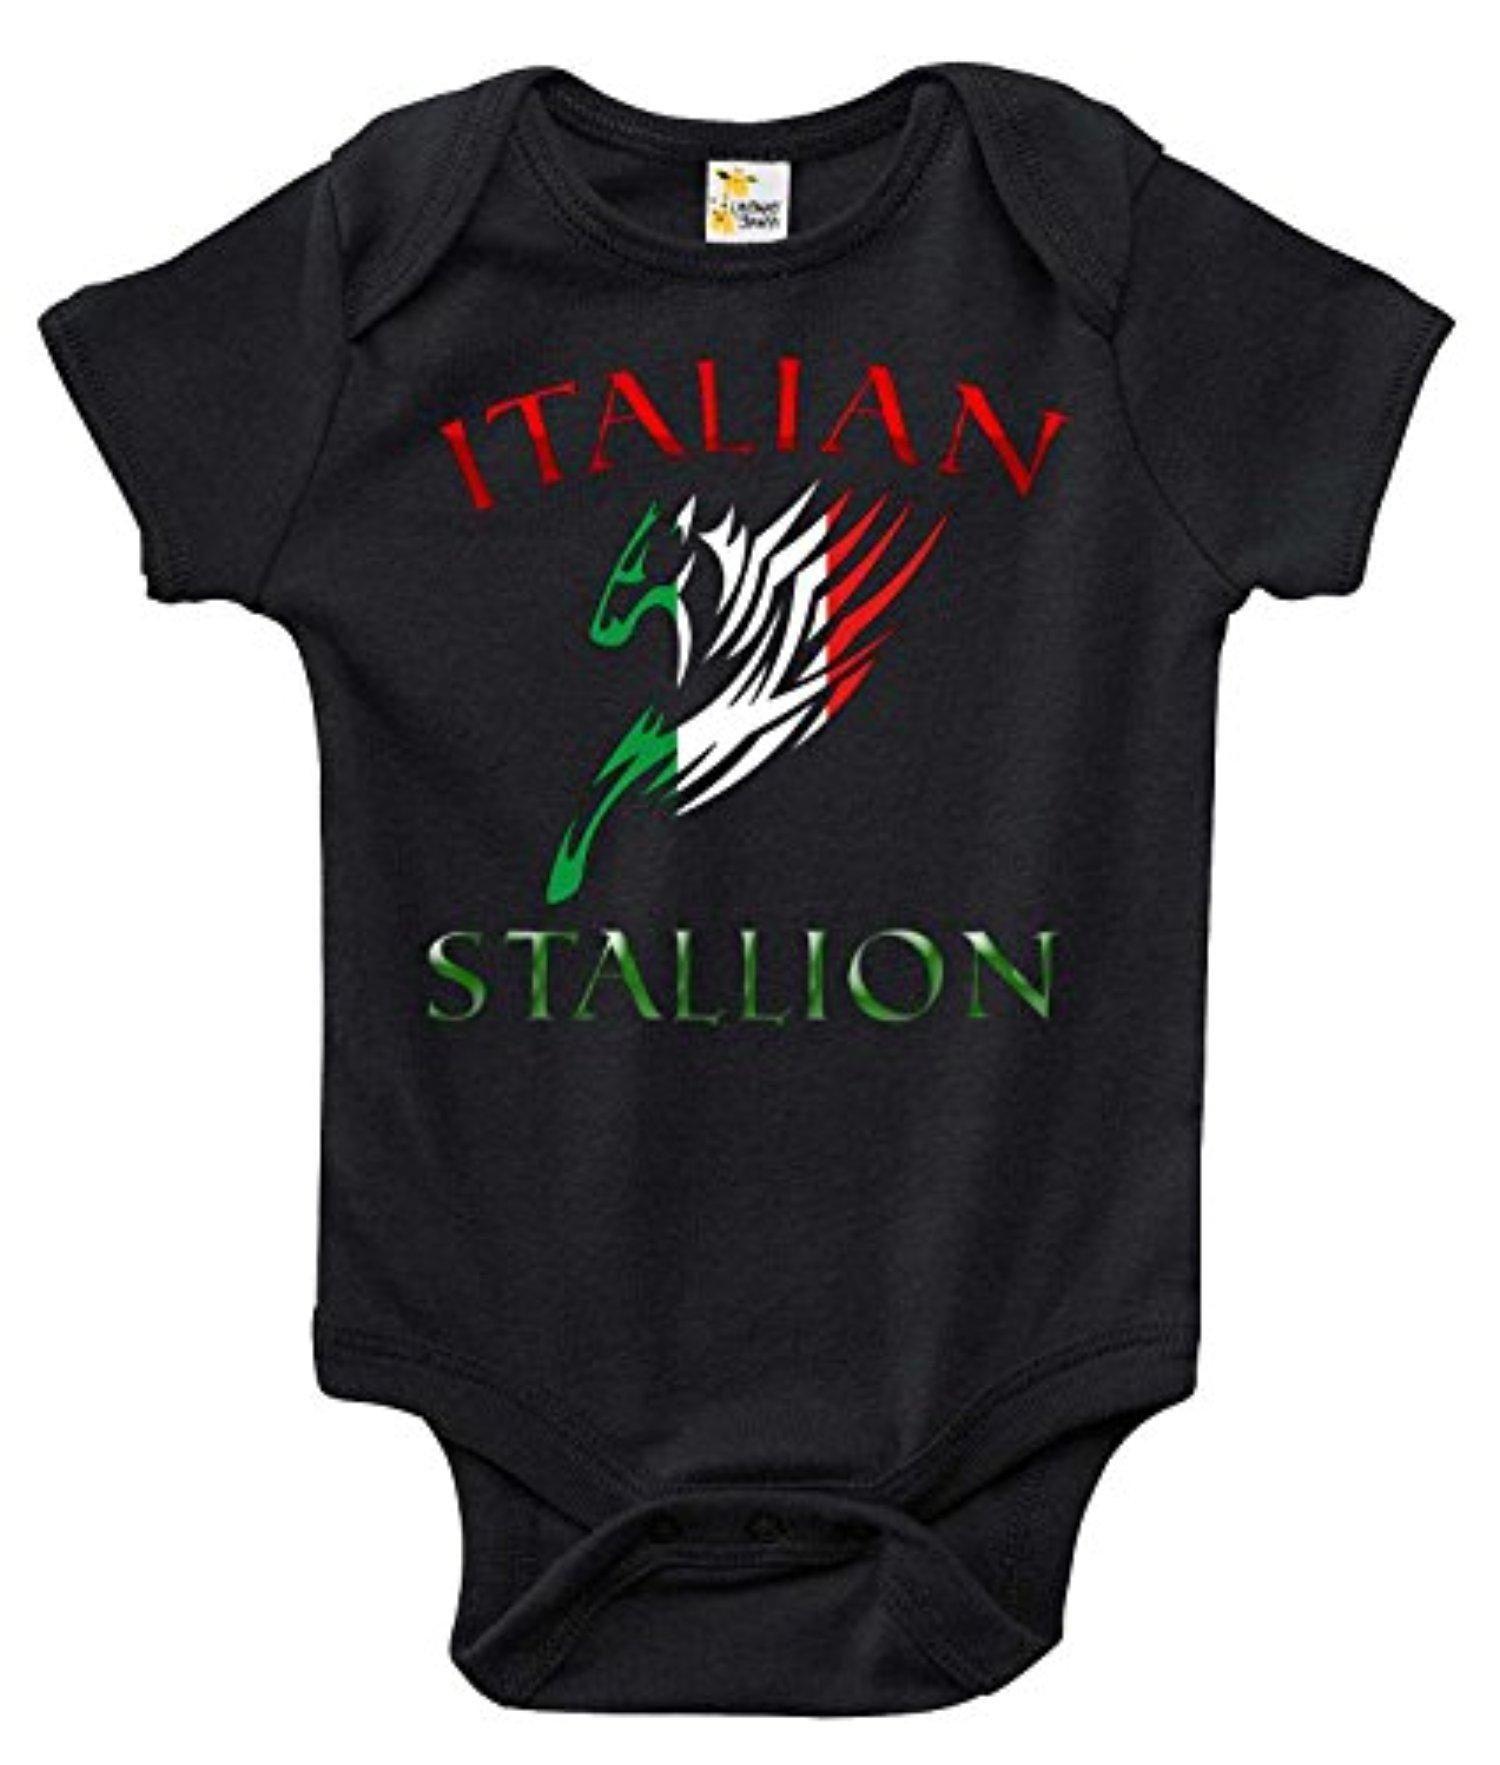 64f4bd17d139 Italian Stallion Funny Cute One-piece Baby Bodysuit Romper for Boys ...